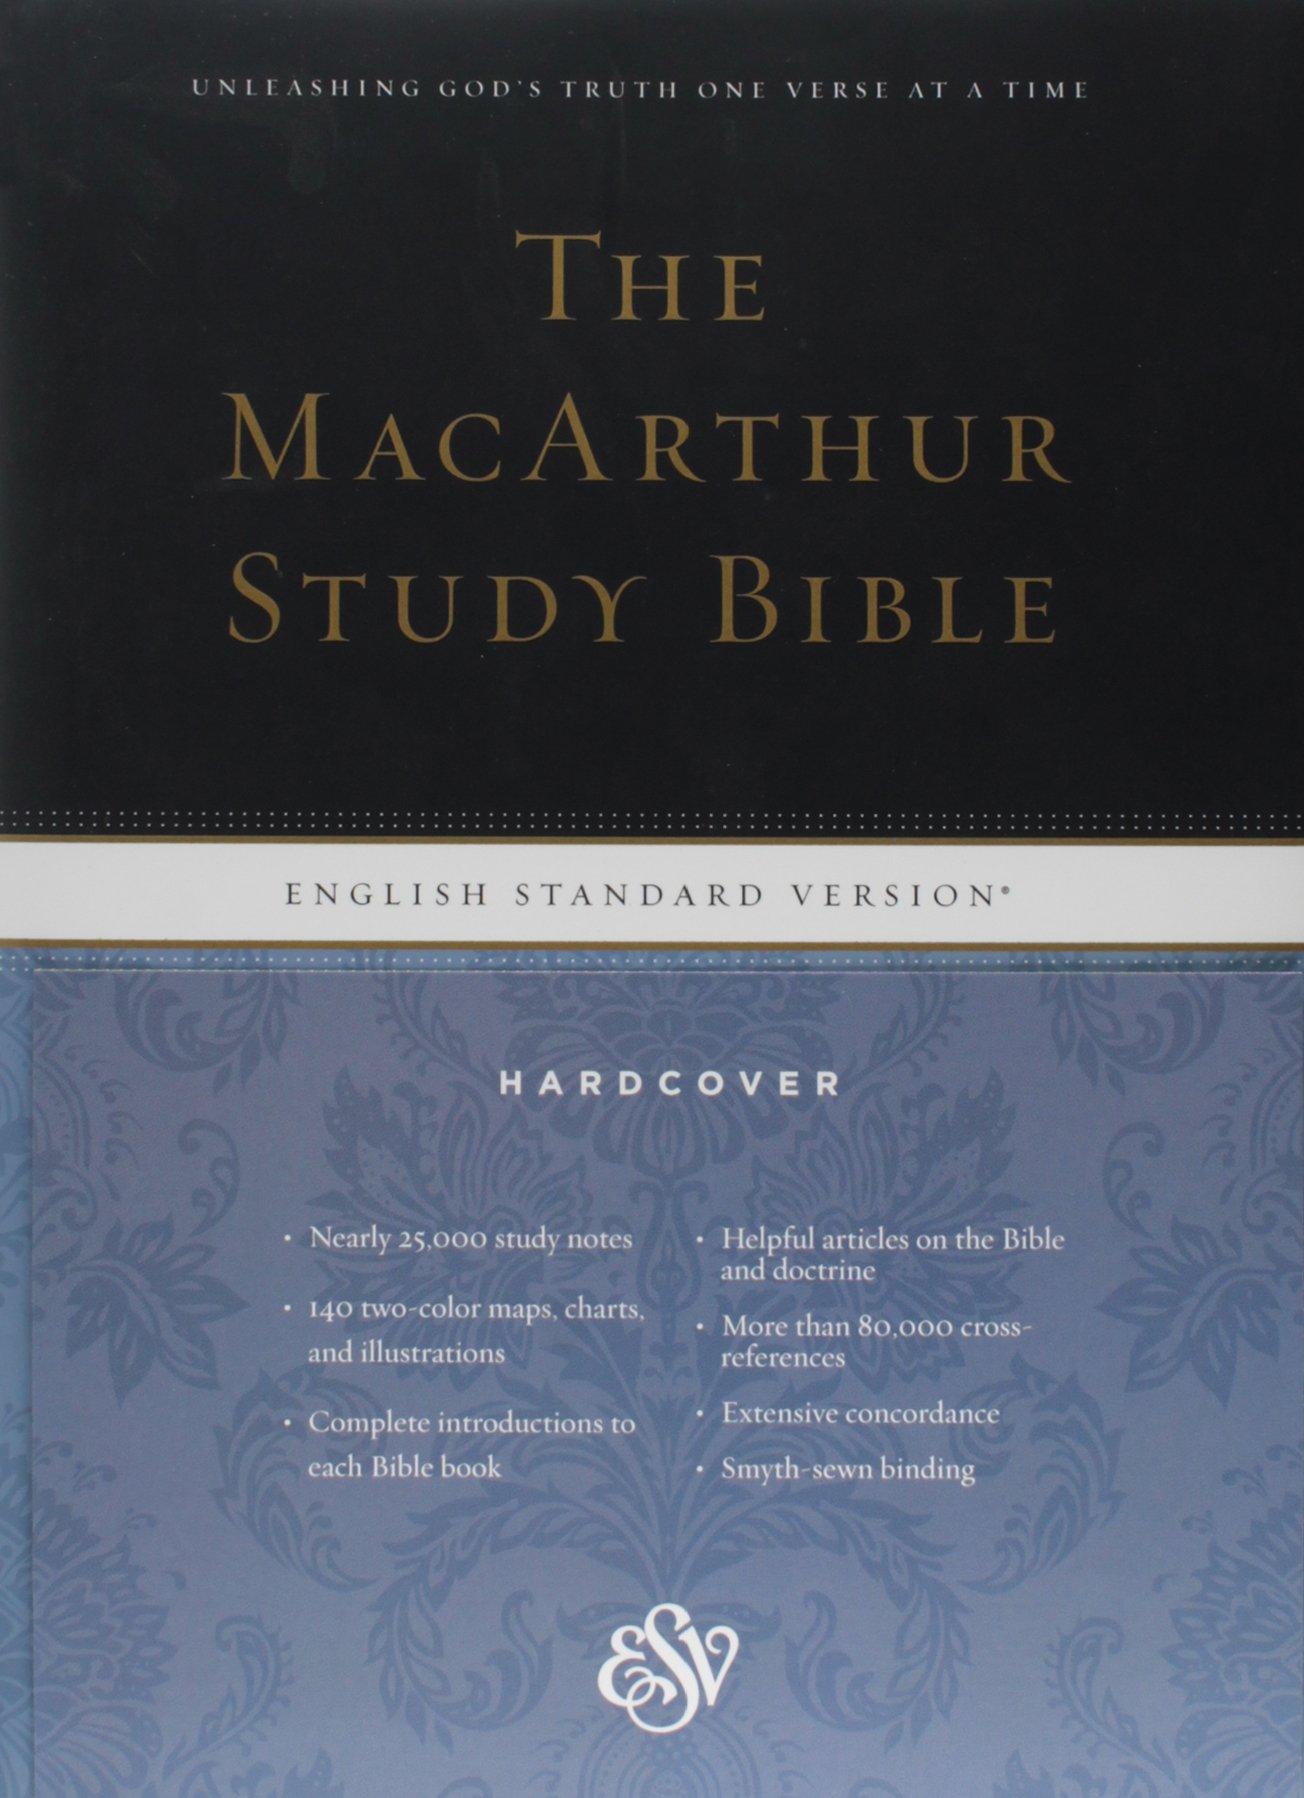 Esv macarthur study bible hardcover john macarthur 9781433504006 esv macarthur study bible hardcover john macarthur 9781433504006 amazon books fandeluxe Gallery